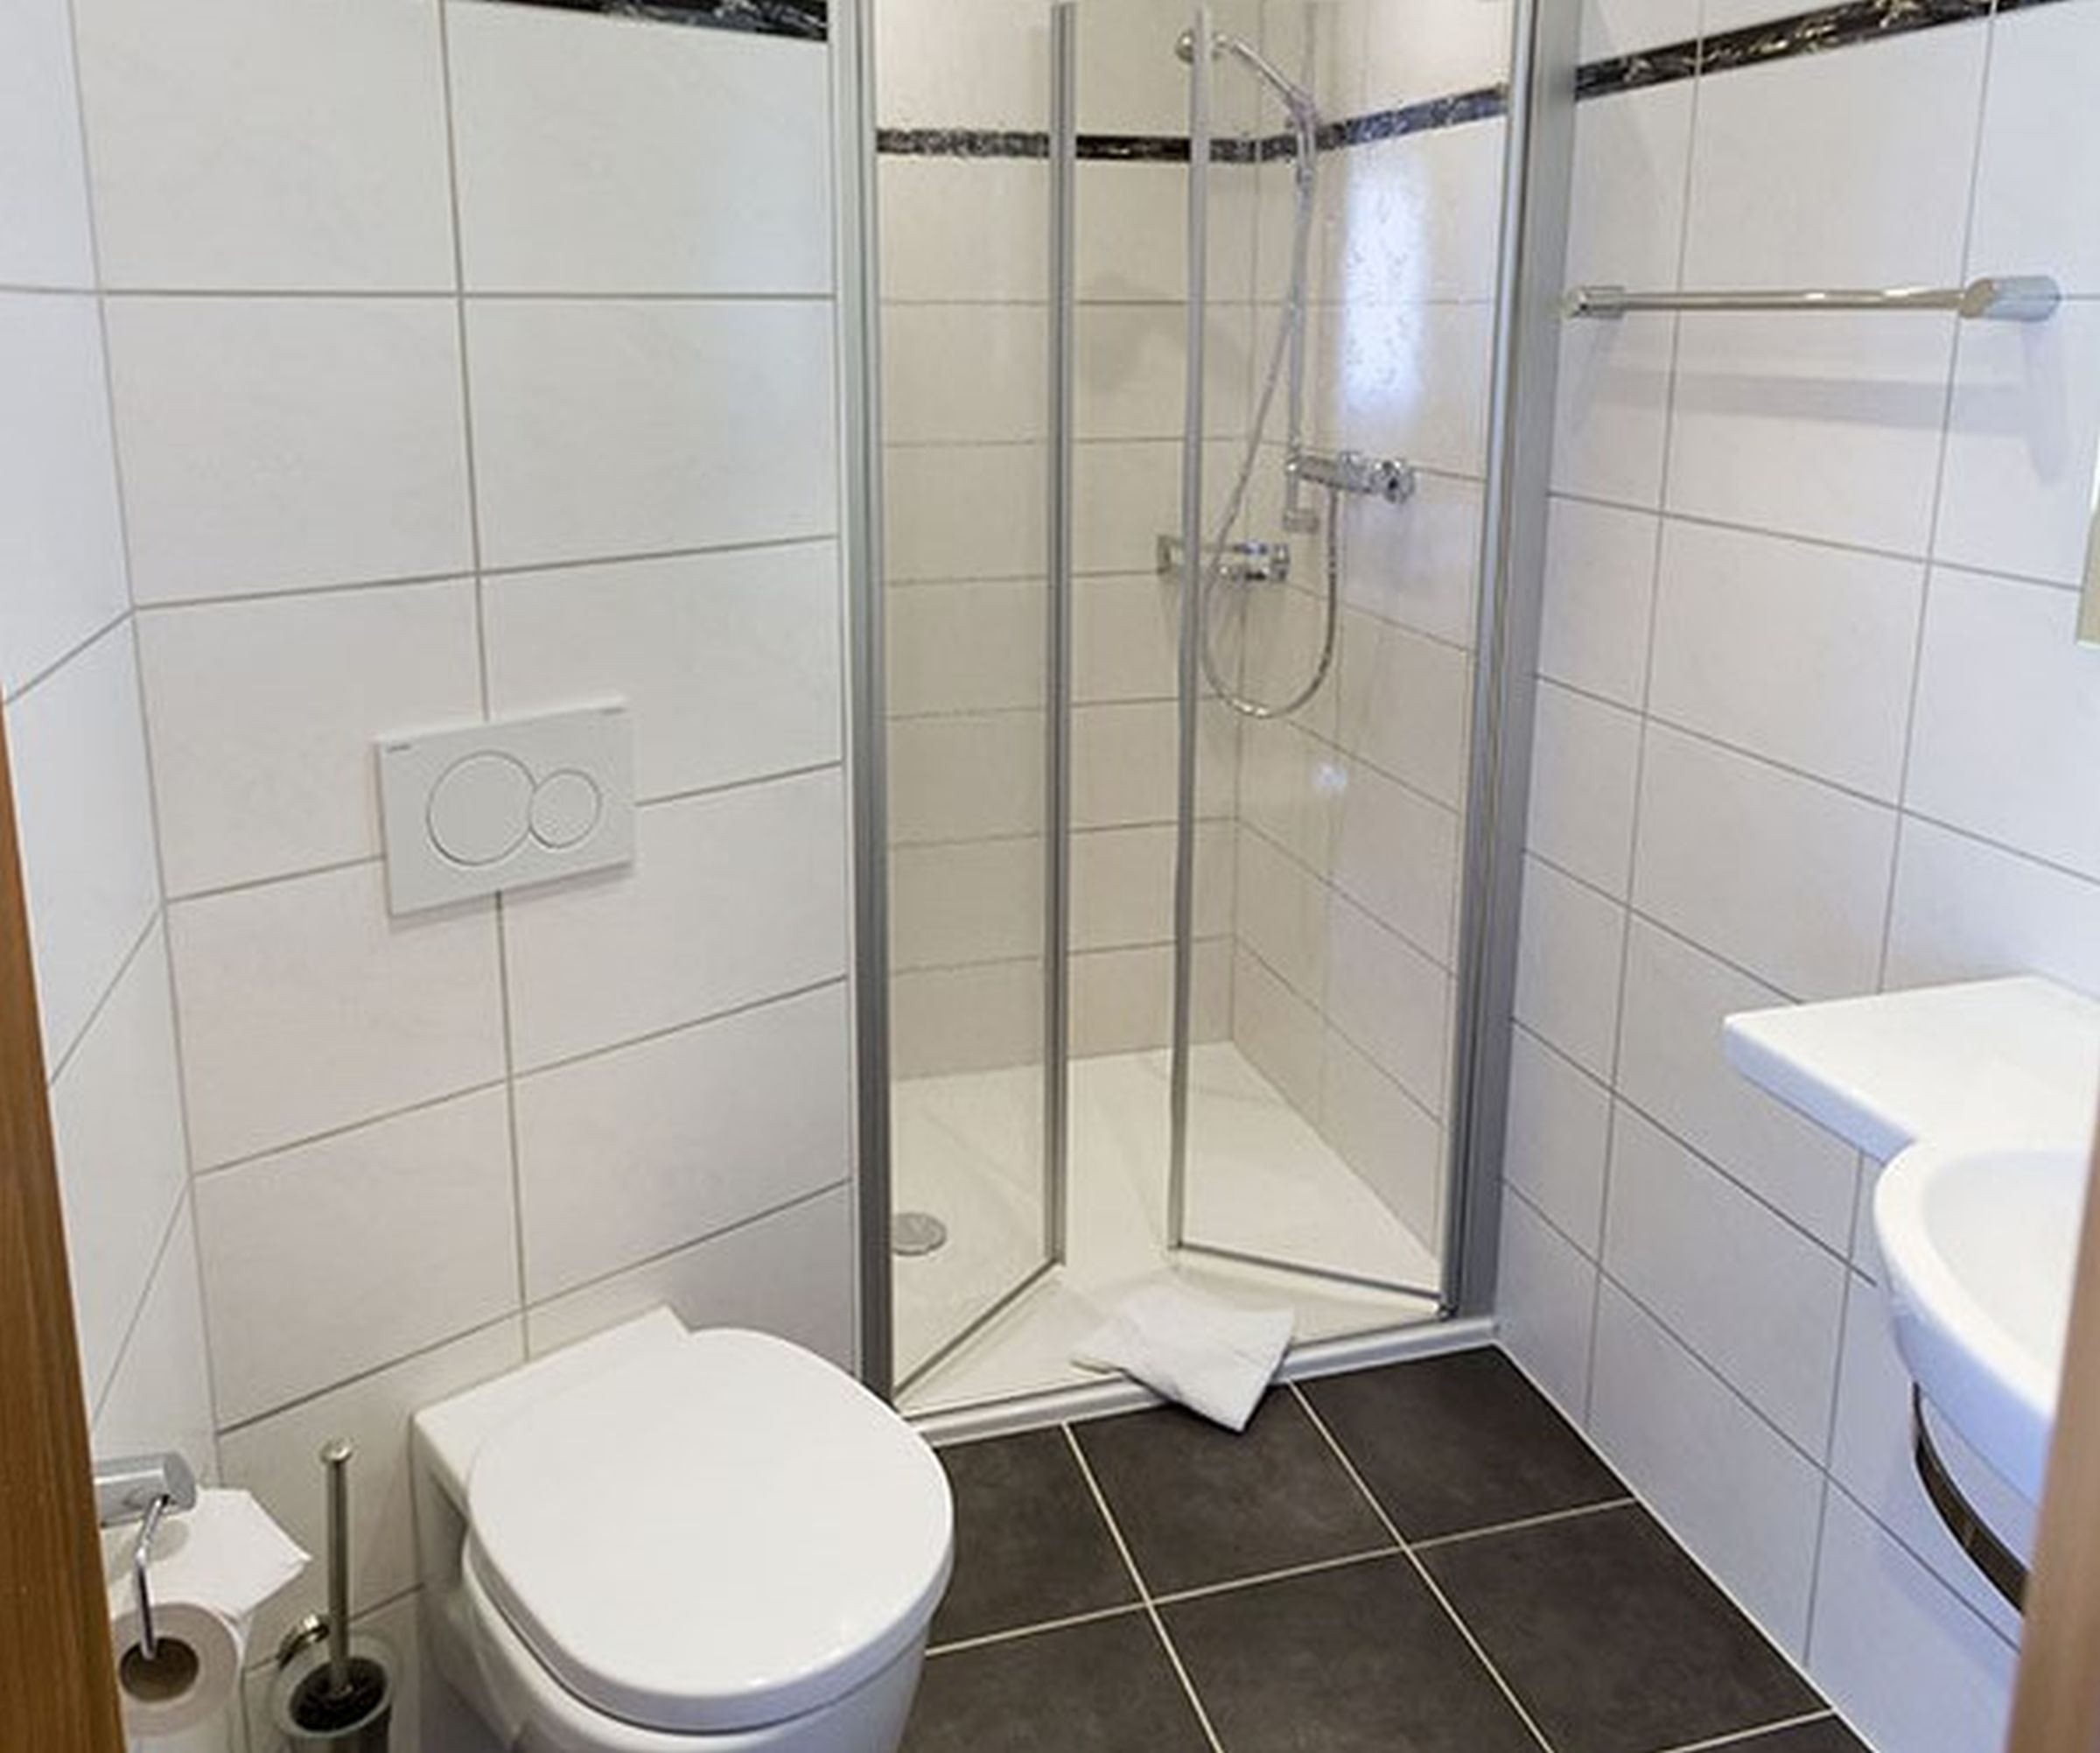 Gasthaus zum rebstock in kressbronn - Badezimmer 15qm ...